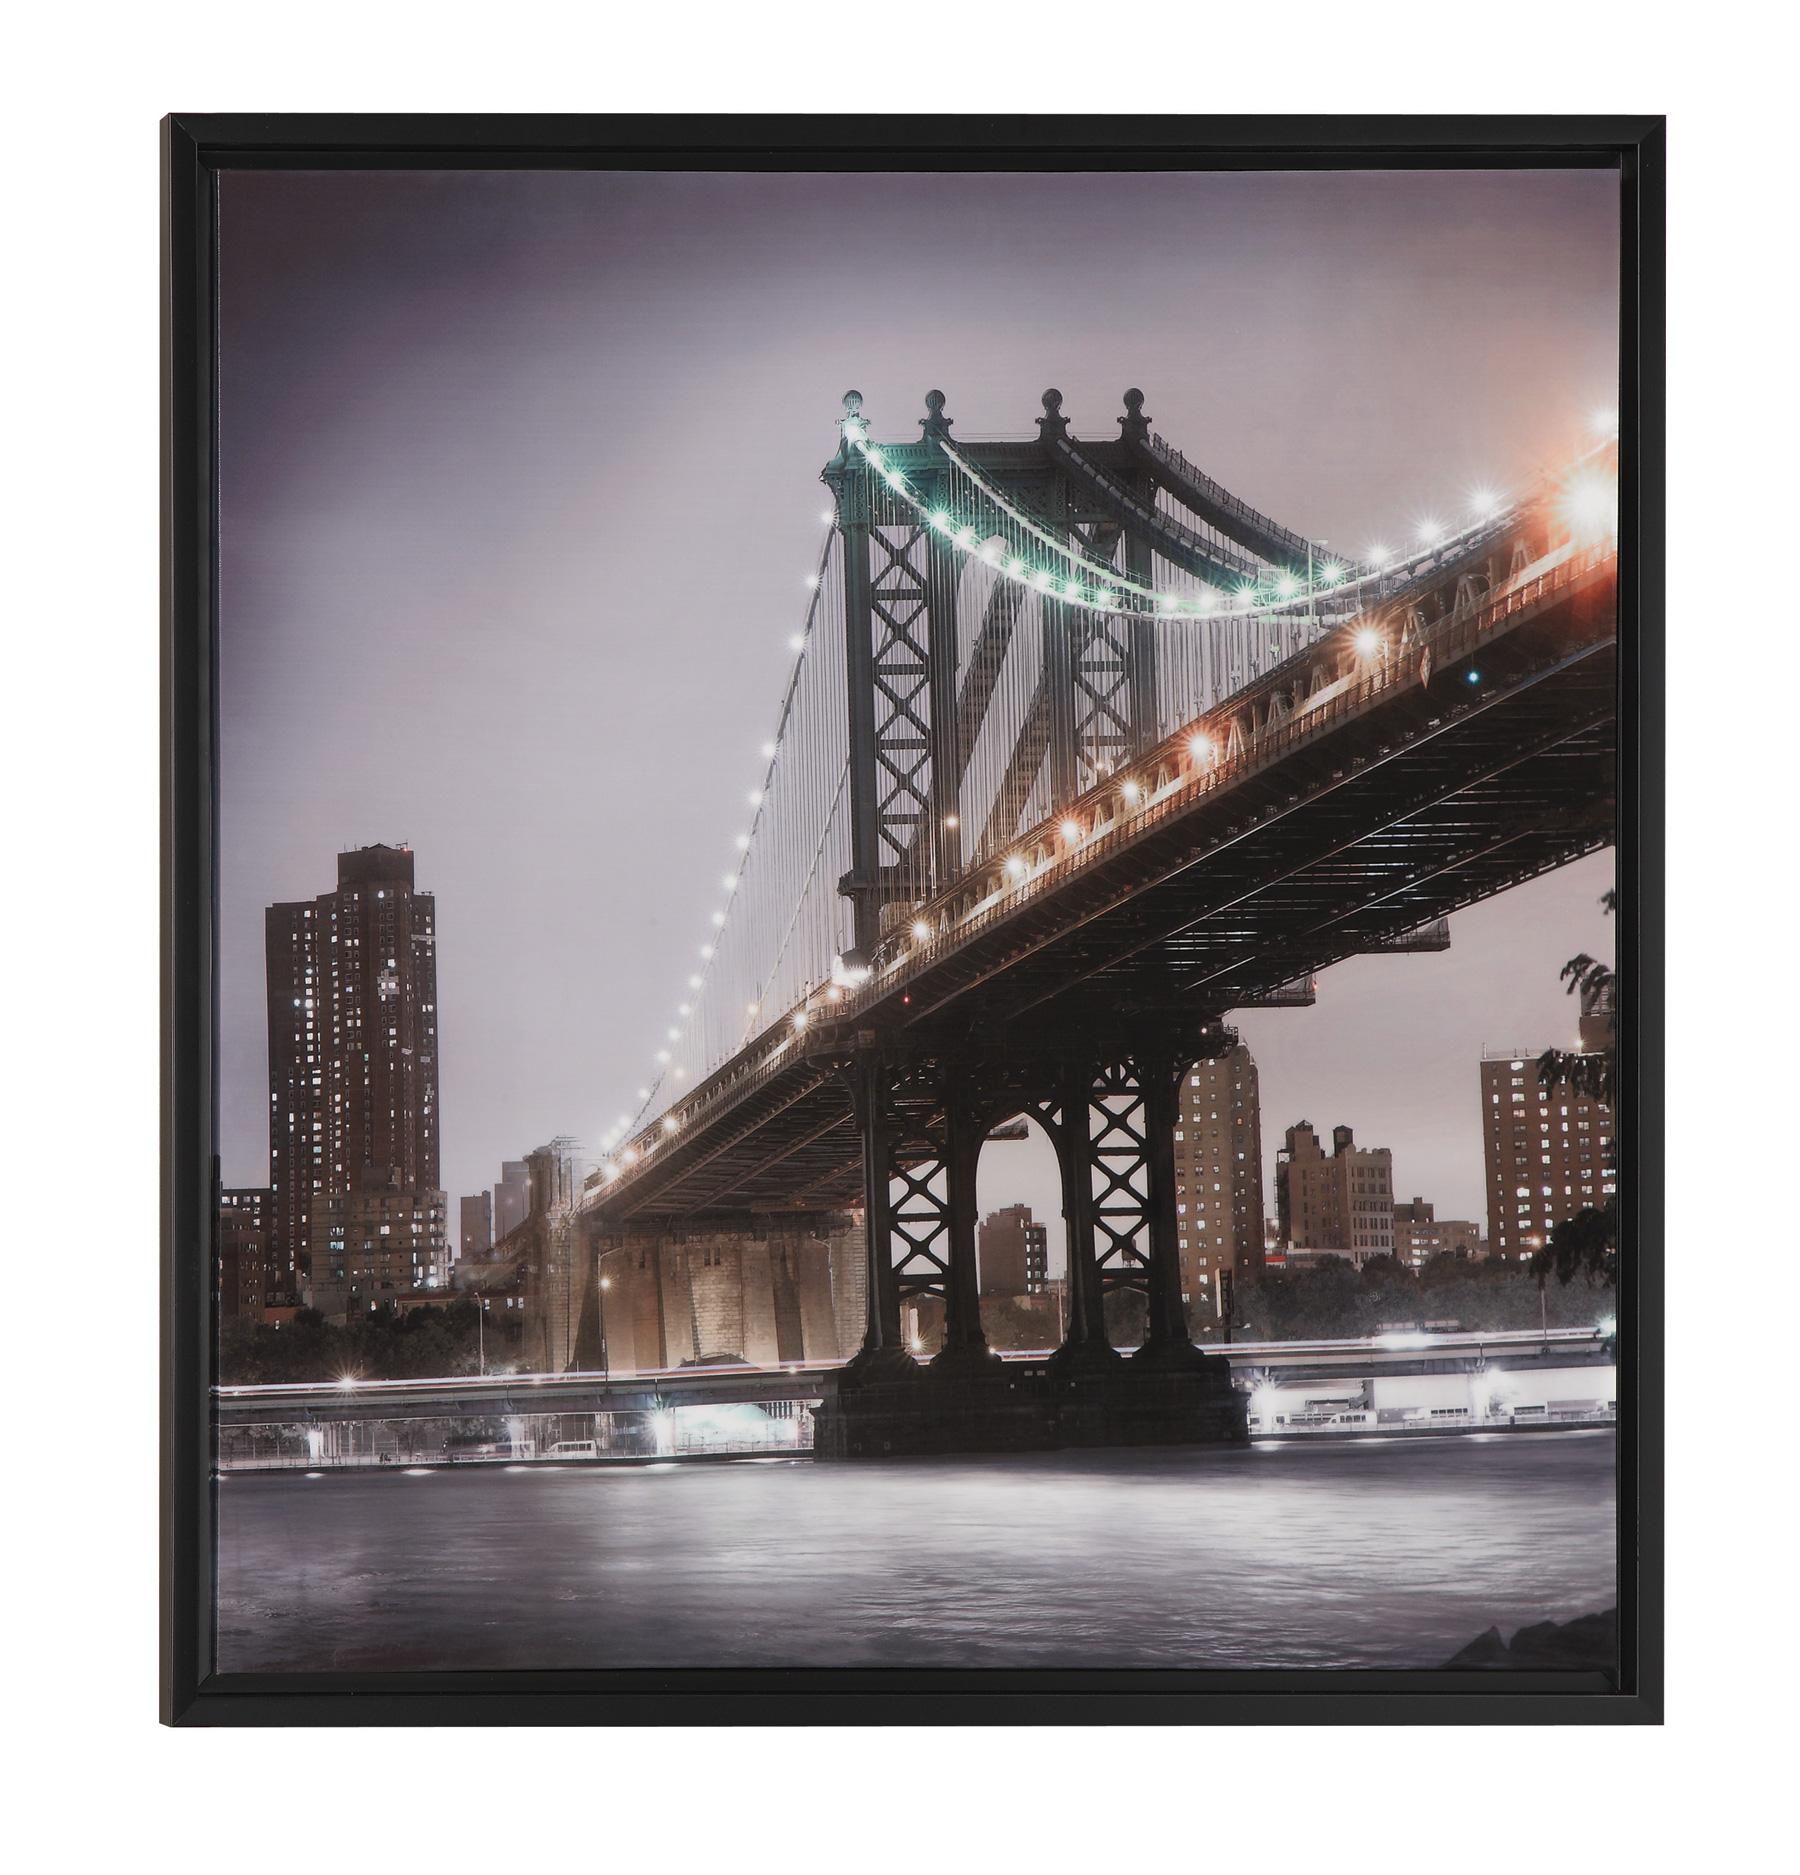 Coaster Wall Art Art - Item Number: 960719